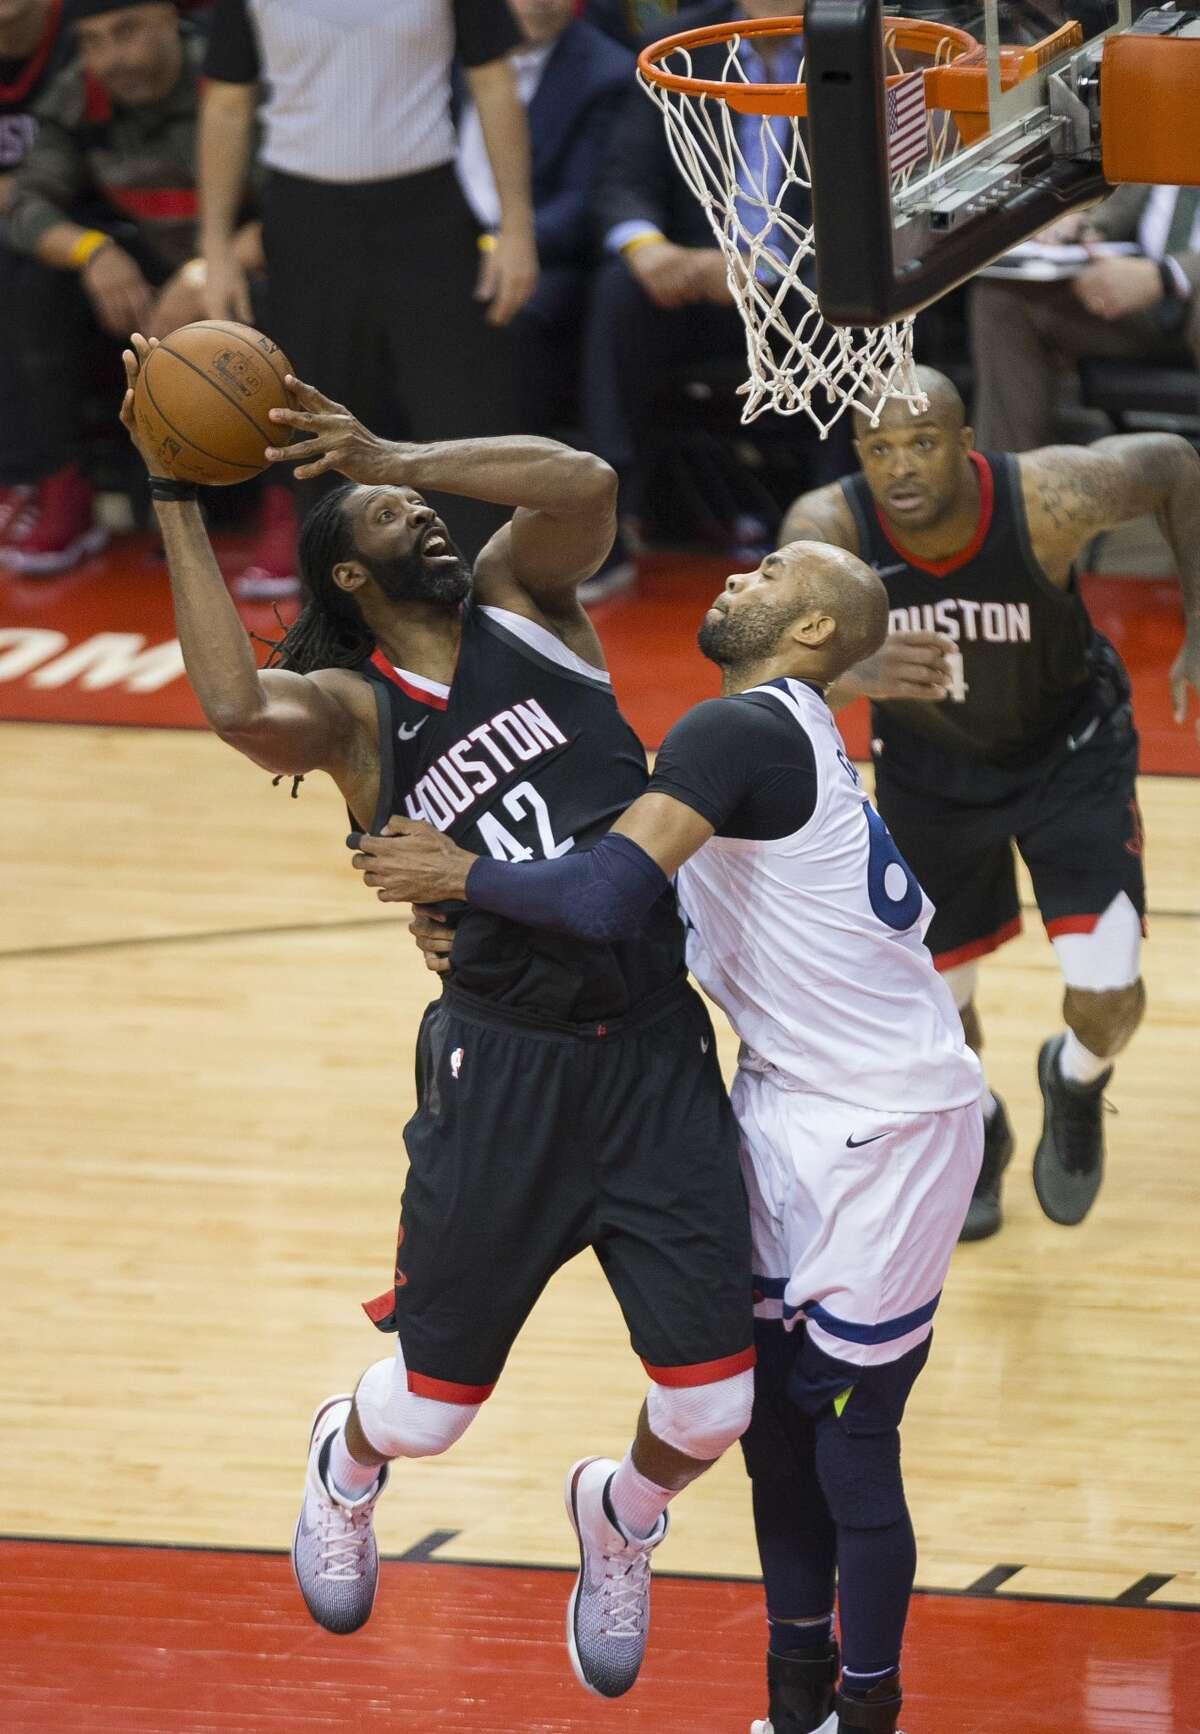 Houston Rockets center Nene (42) shoots over Minnesota Timberwolves forward Taj Gibson (67) during Game 5 of an NBA basketball first-round playoff series Wednesday, April 25, 2018, in Houston. (Mark Mulligan/Houston Chronicle via AP)